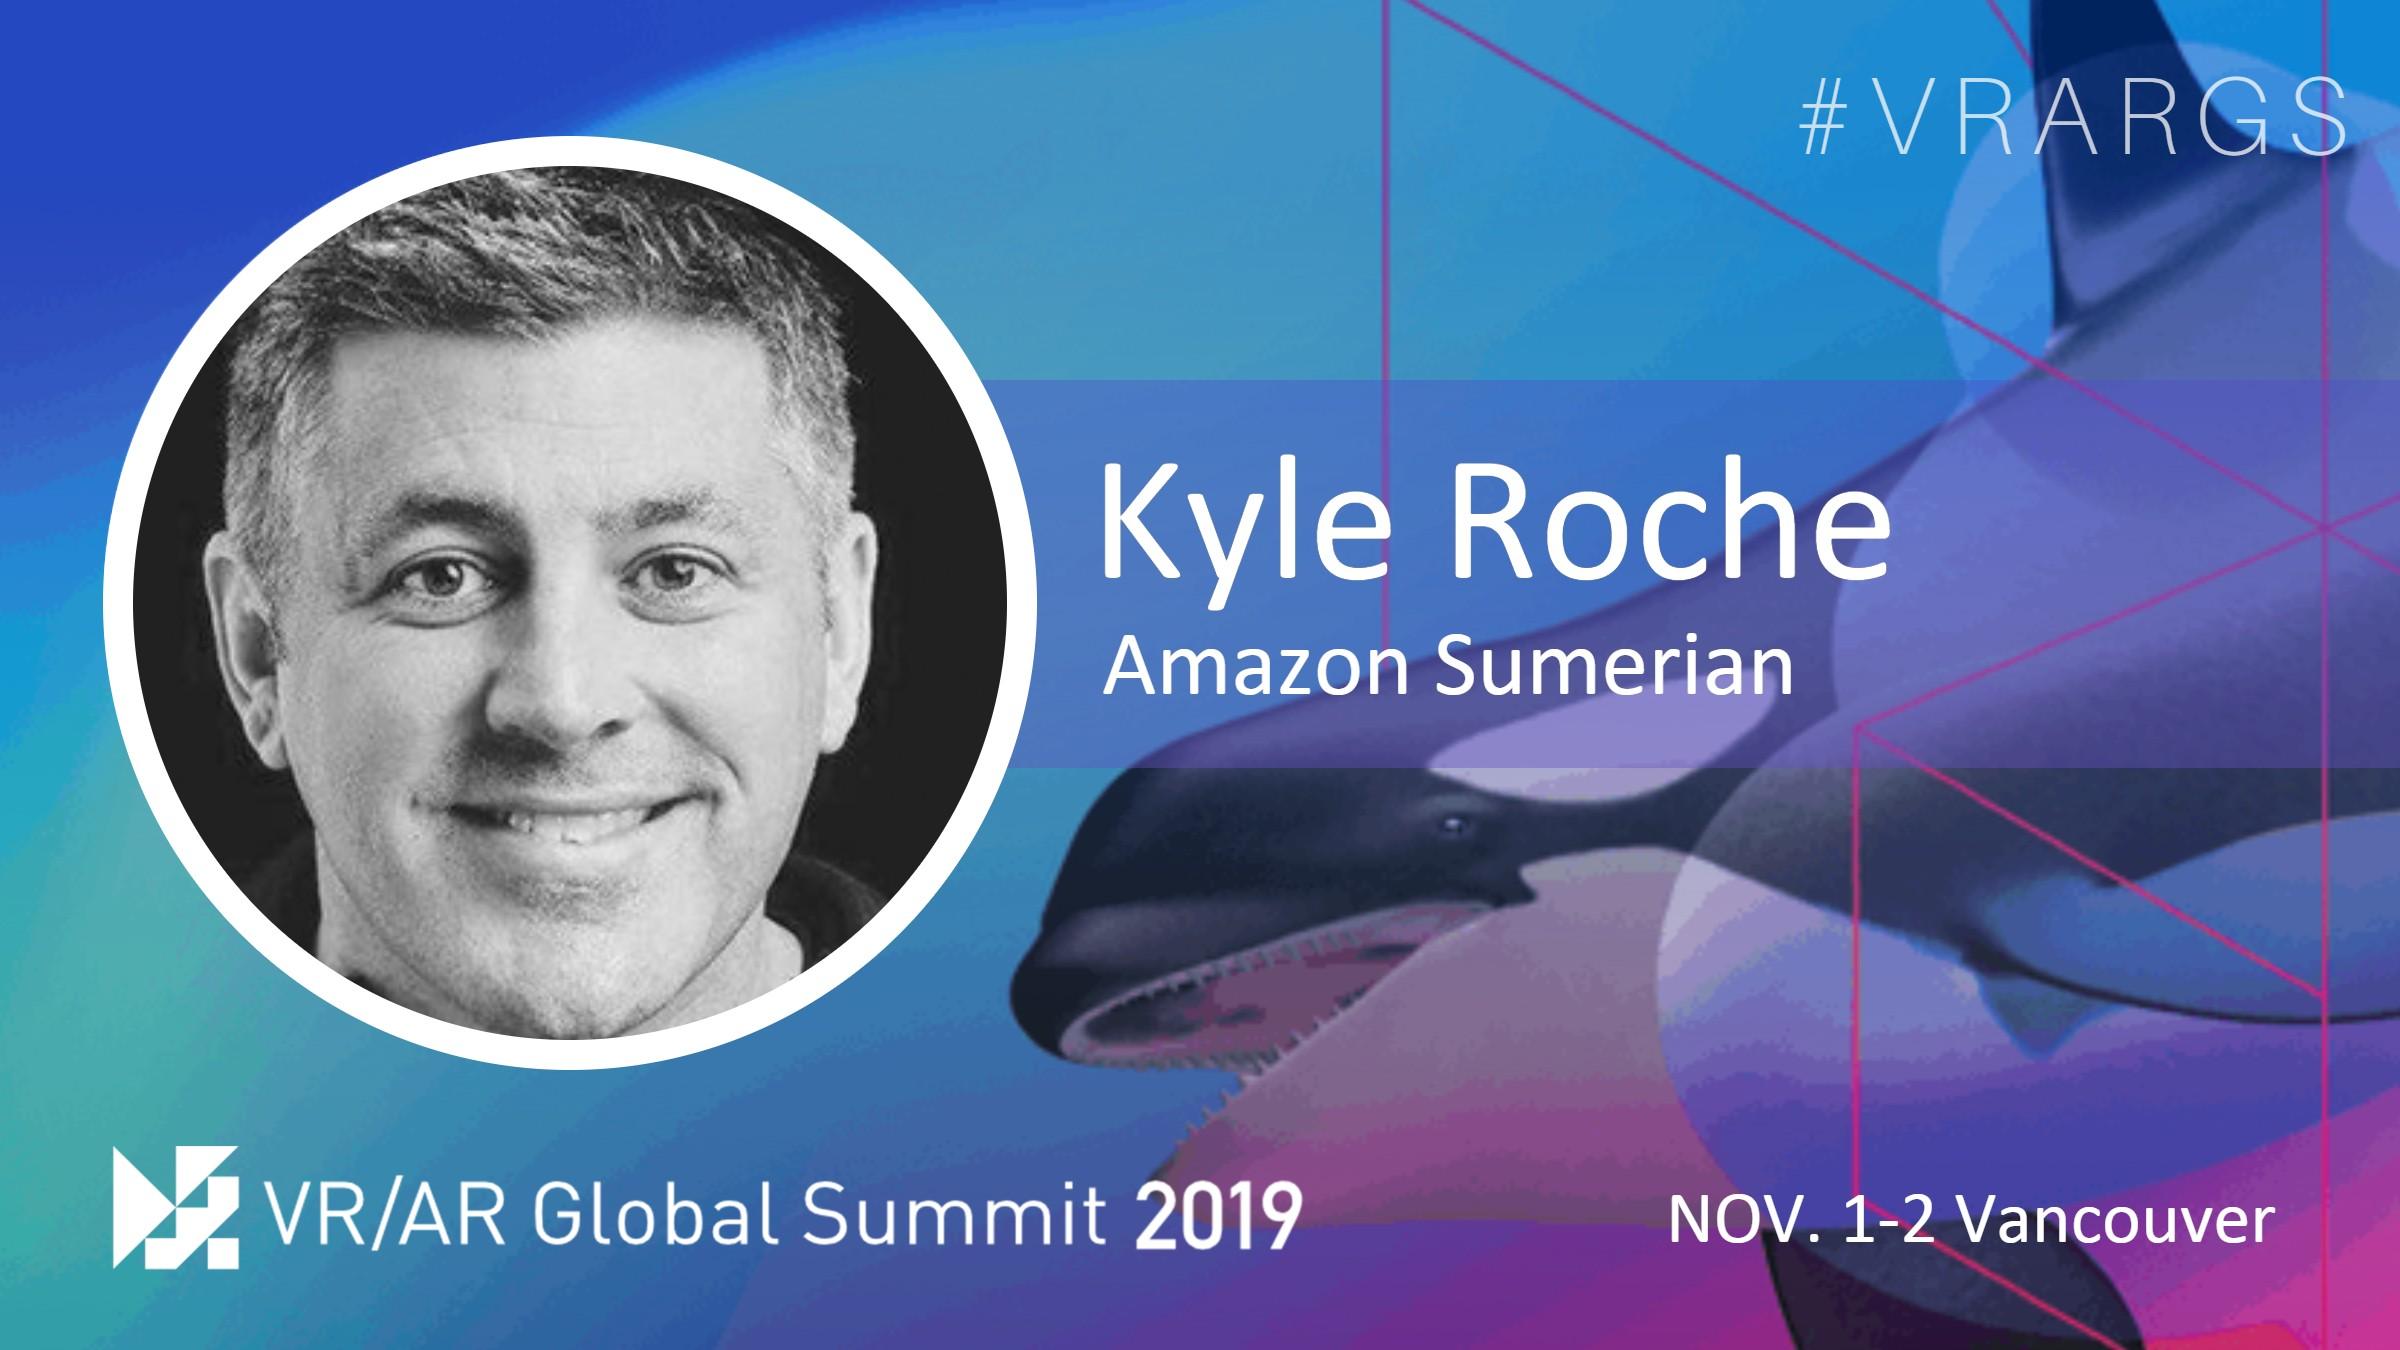 HighRes-Kyle-Rche-Amazon-Sumerian-VRARGS-VRAR-Global-Summit-Spatial-Computing-Vancouver-Women-In-XR.jpg